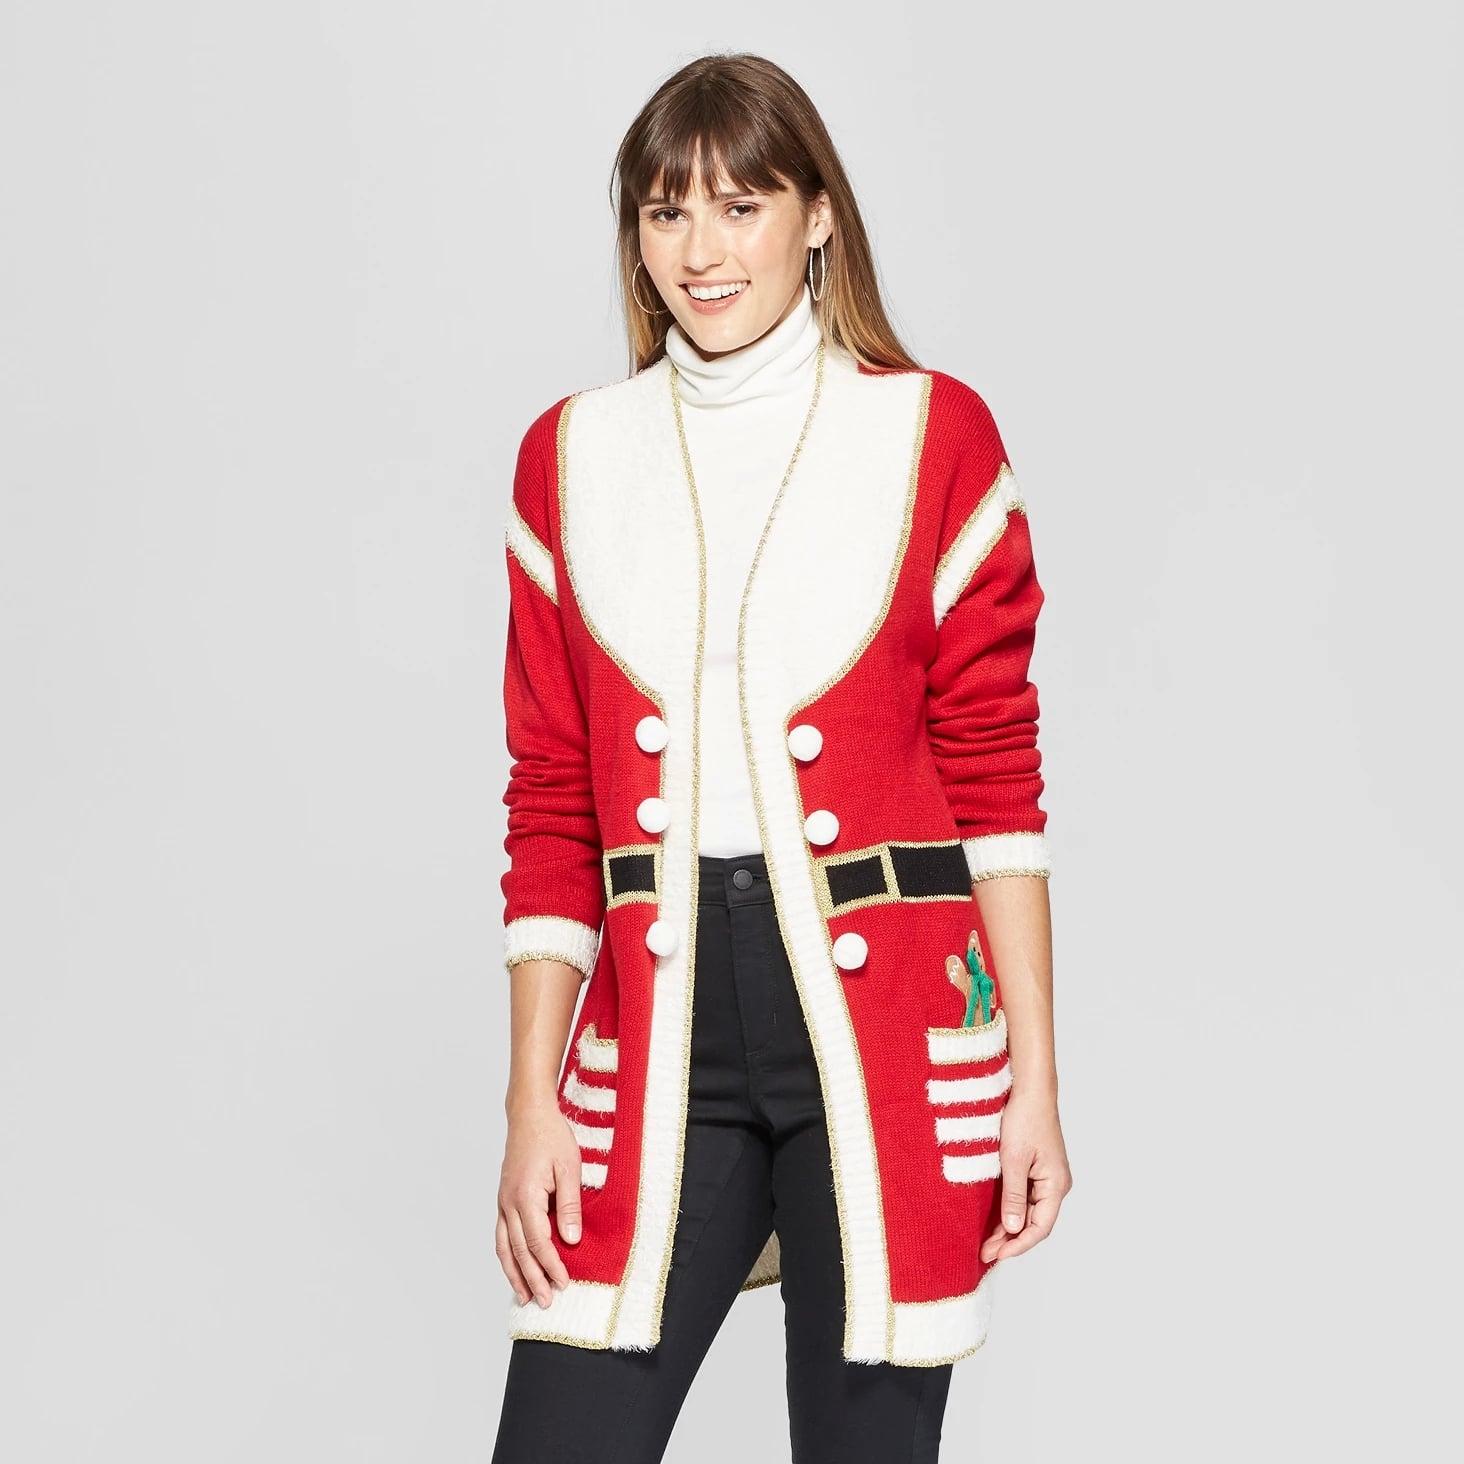 Christmas Cardigan.Women S Santa Ugly Christmas Cardigan Target Is Selling